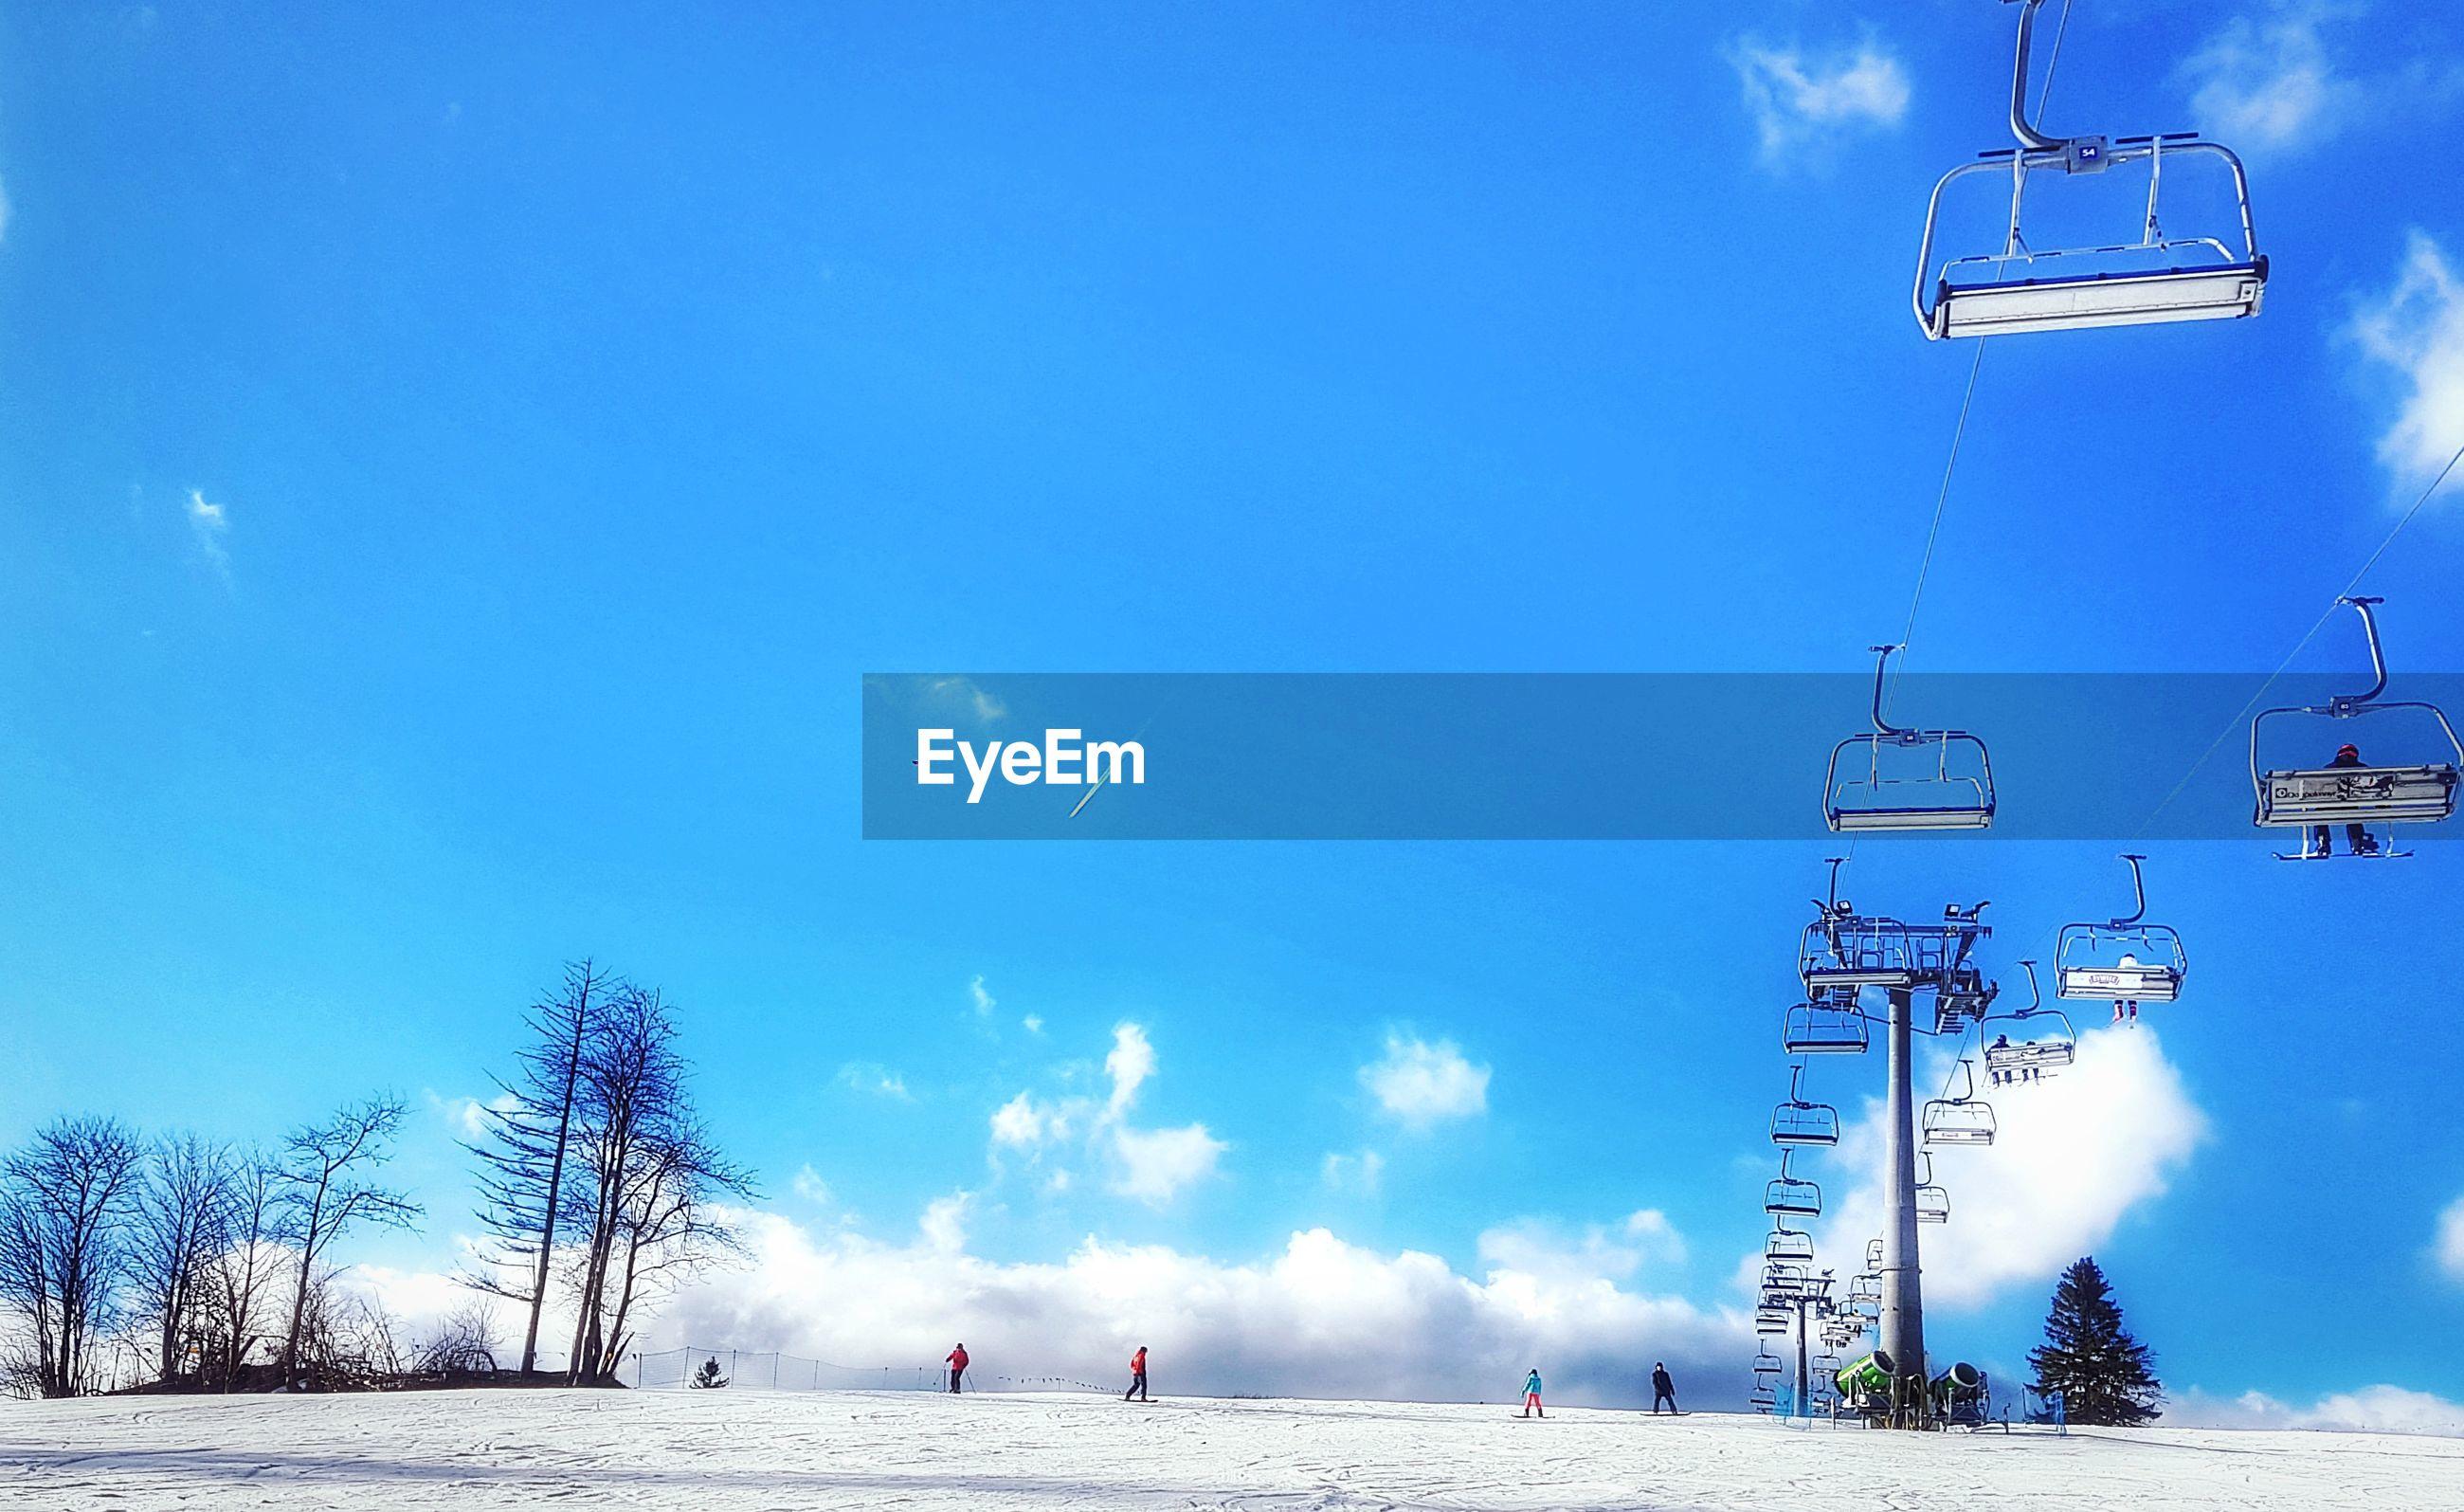 Perfect day to ski